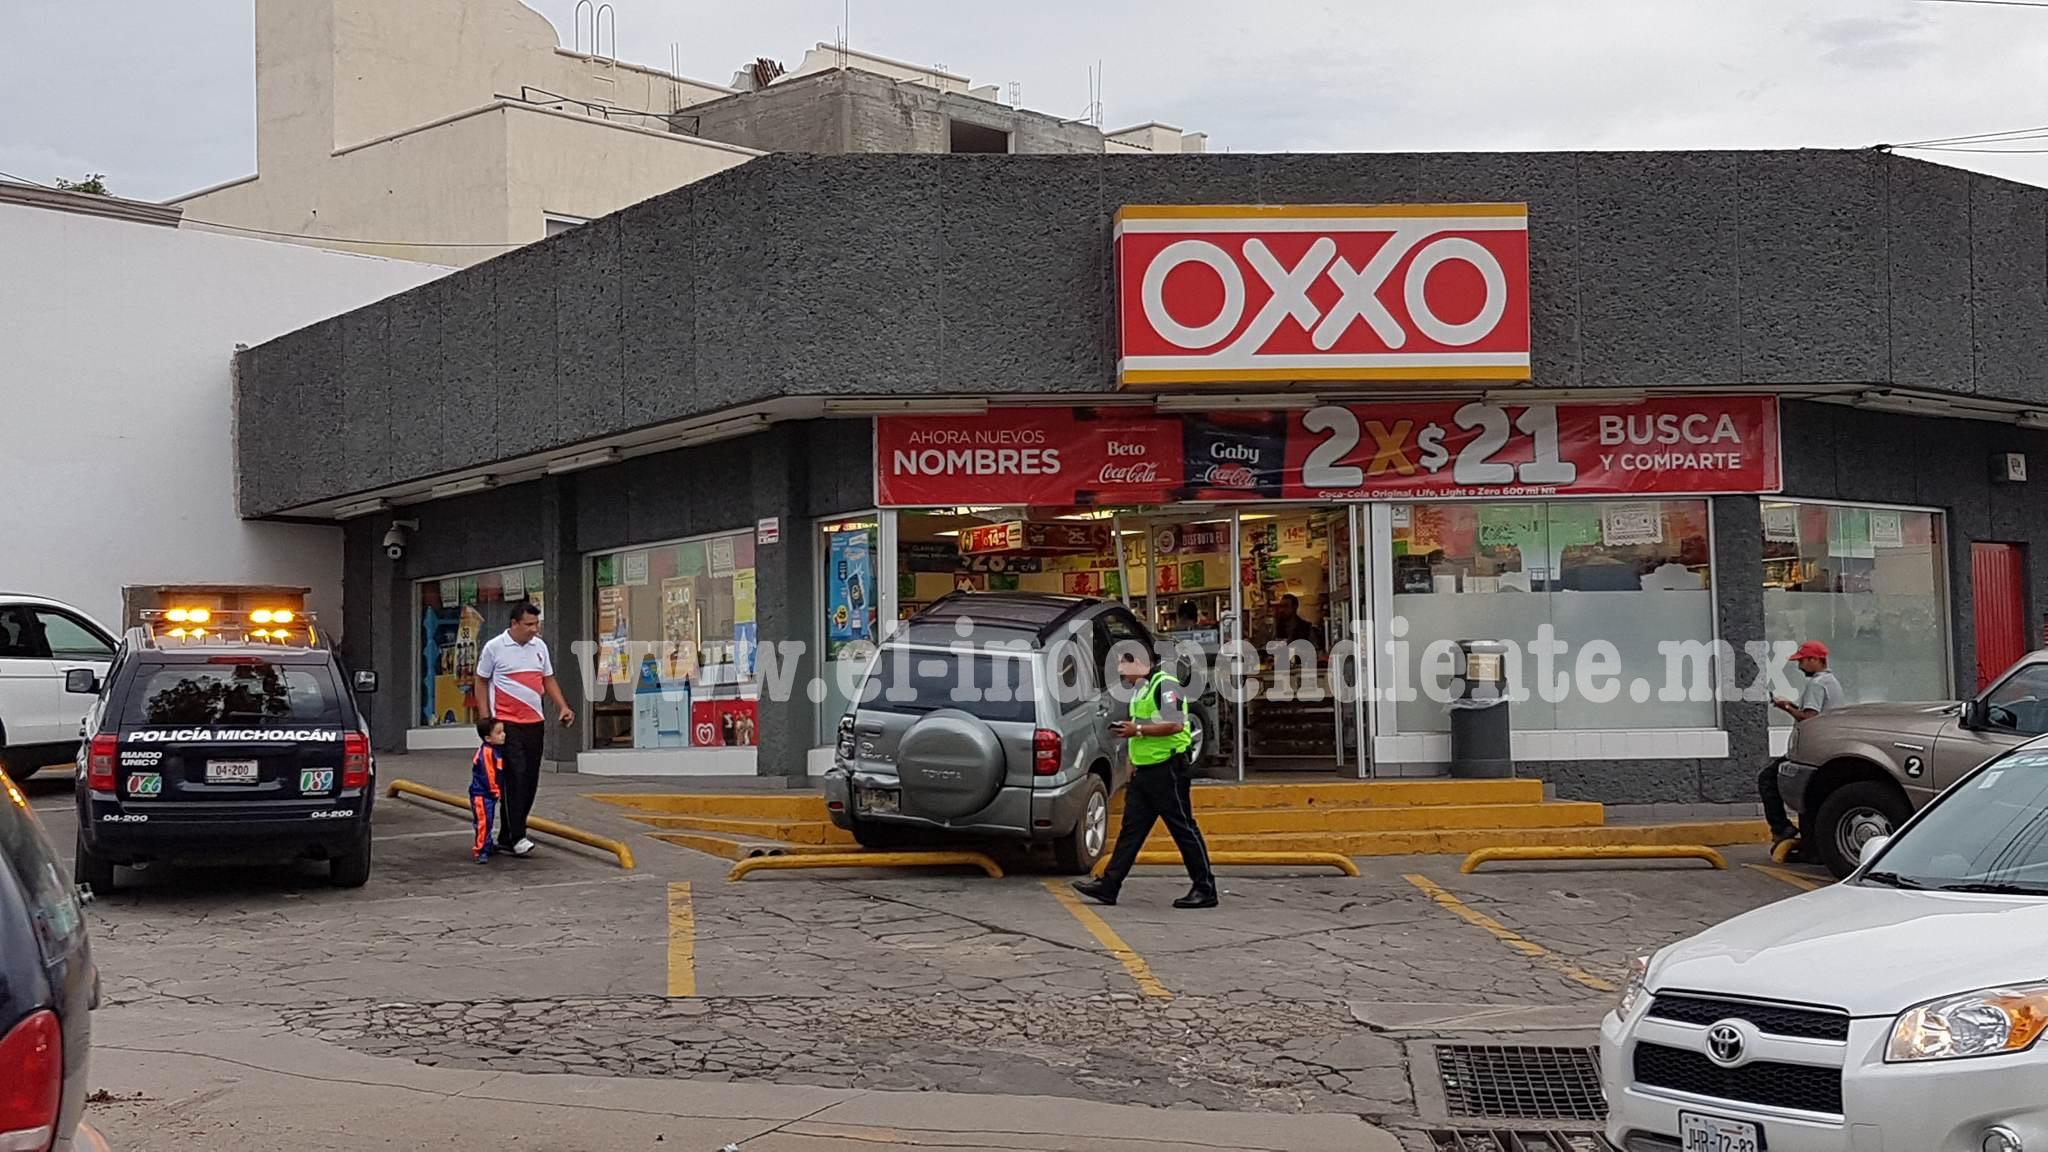 Camioneta termina parcialmente dentro de un Oxxo, no hay víctimas